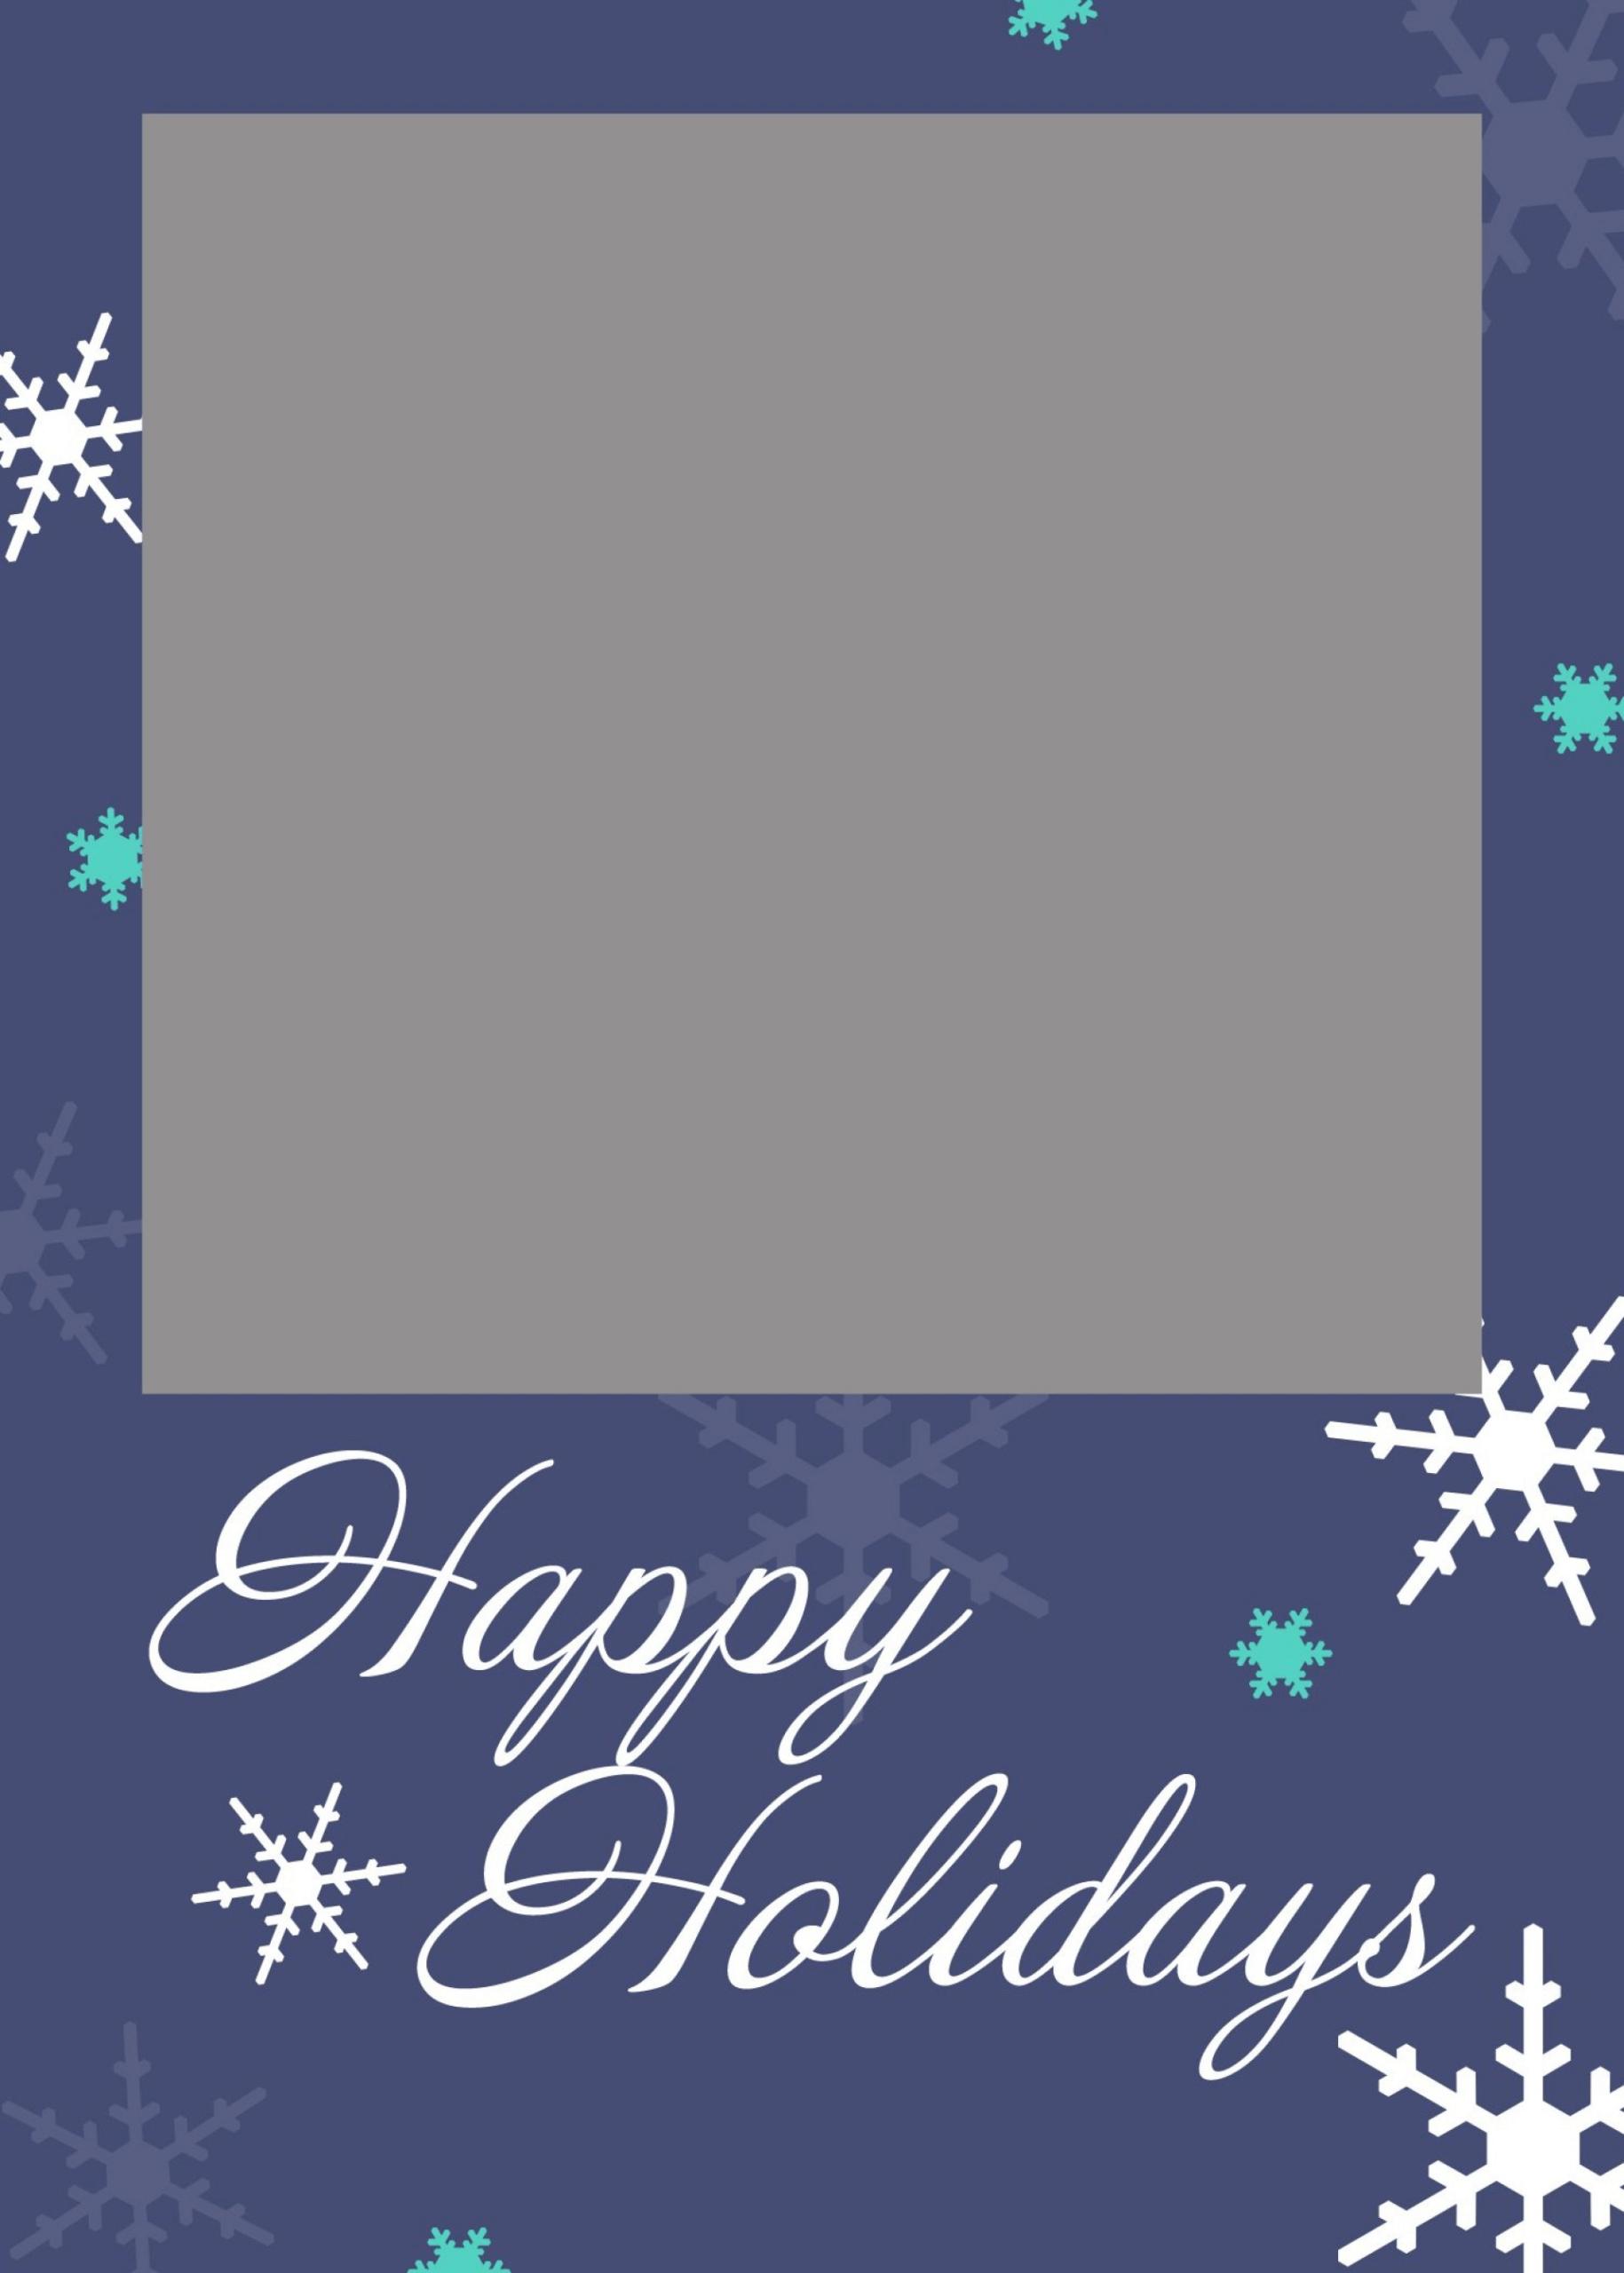 006 Free Holiday Photo Card Templates Printable Greeting Regarding Free Holiday Photo Card Templates